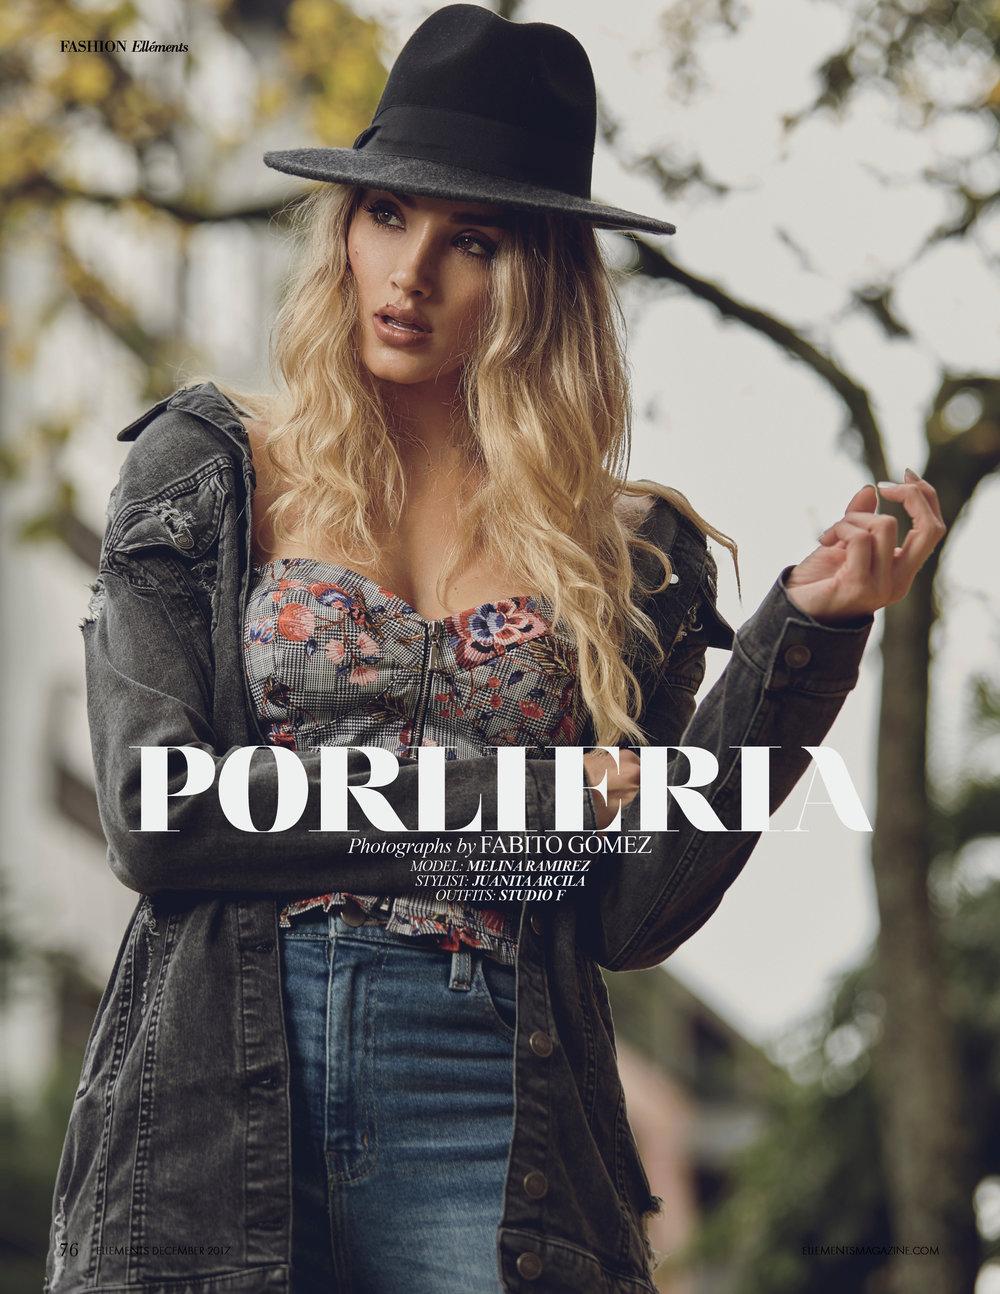 201712-Ellements-Porlieria-02.jpg